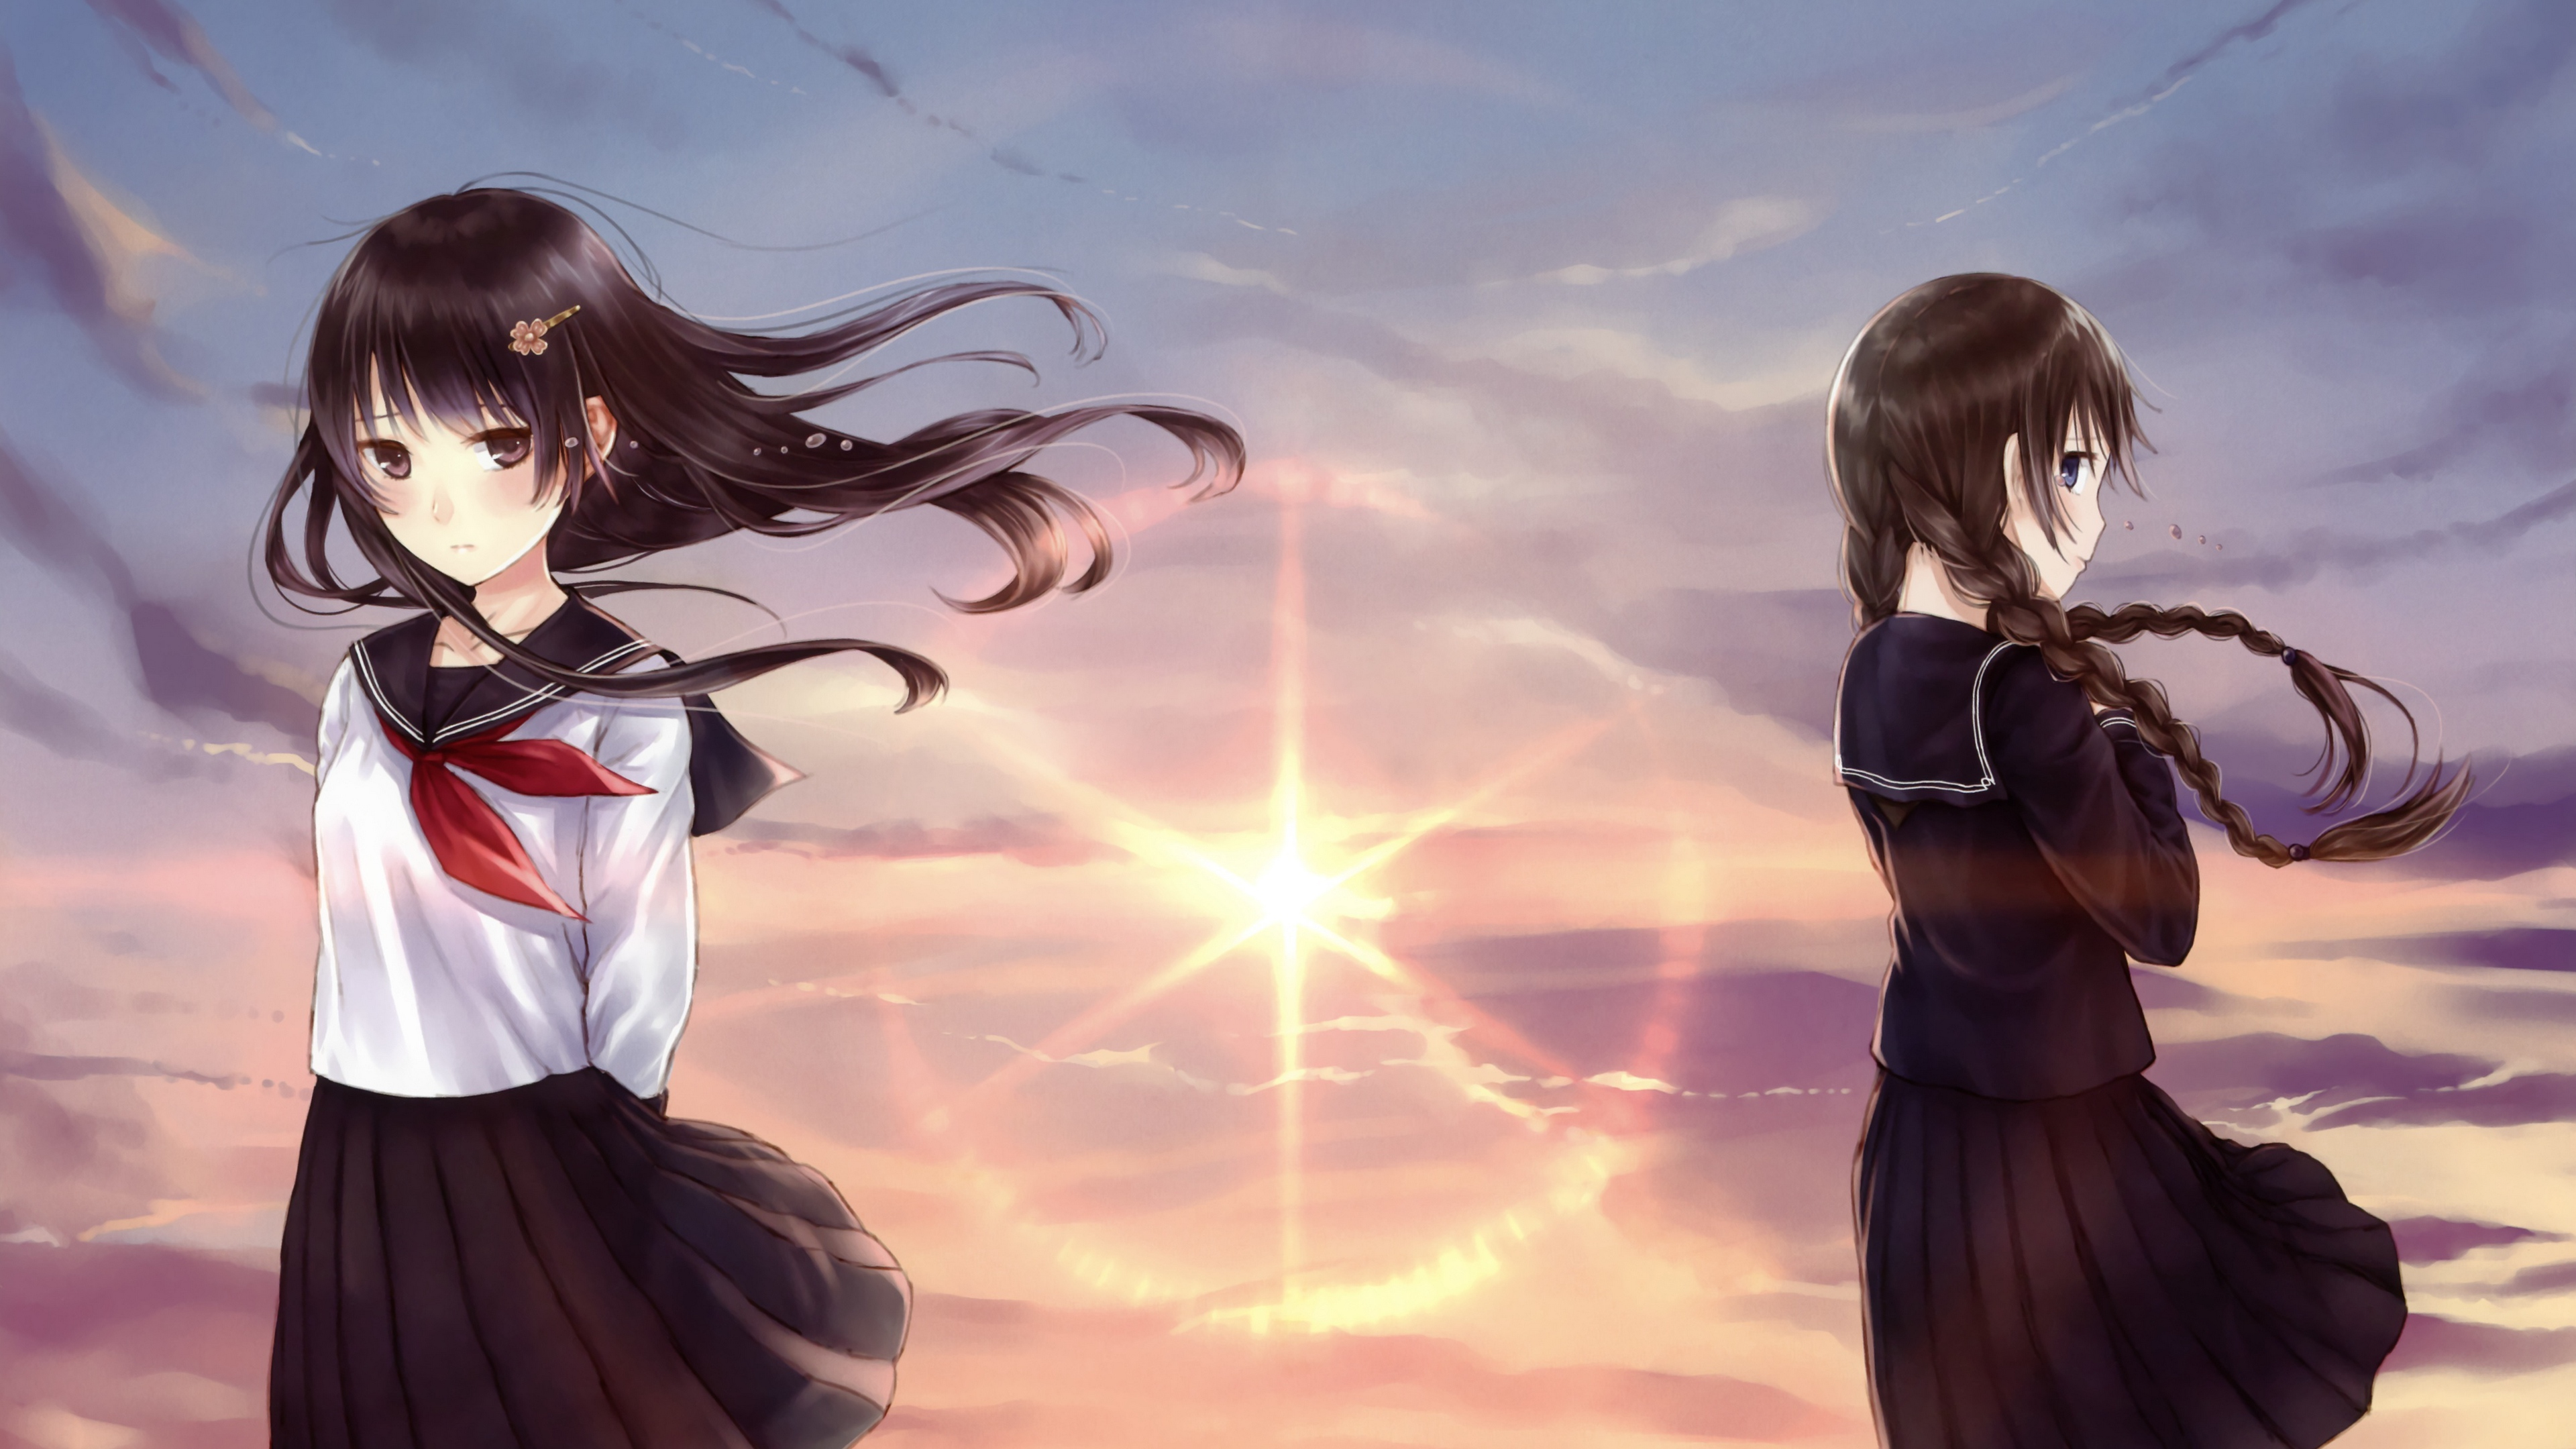 kazuharu kina girl schoolgirl art 4k 1541975681 - kazuharu kina, girl, schoolgirl, art 4k - schoolgirl, kazuharu kina, Girl